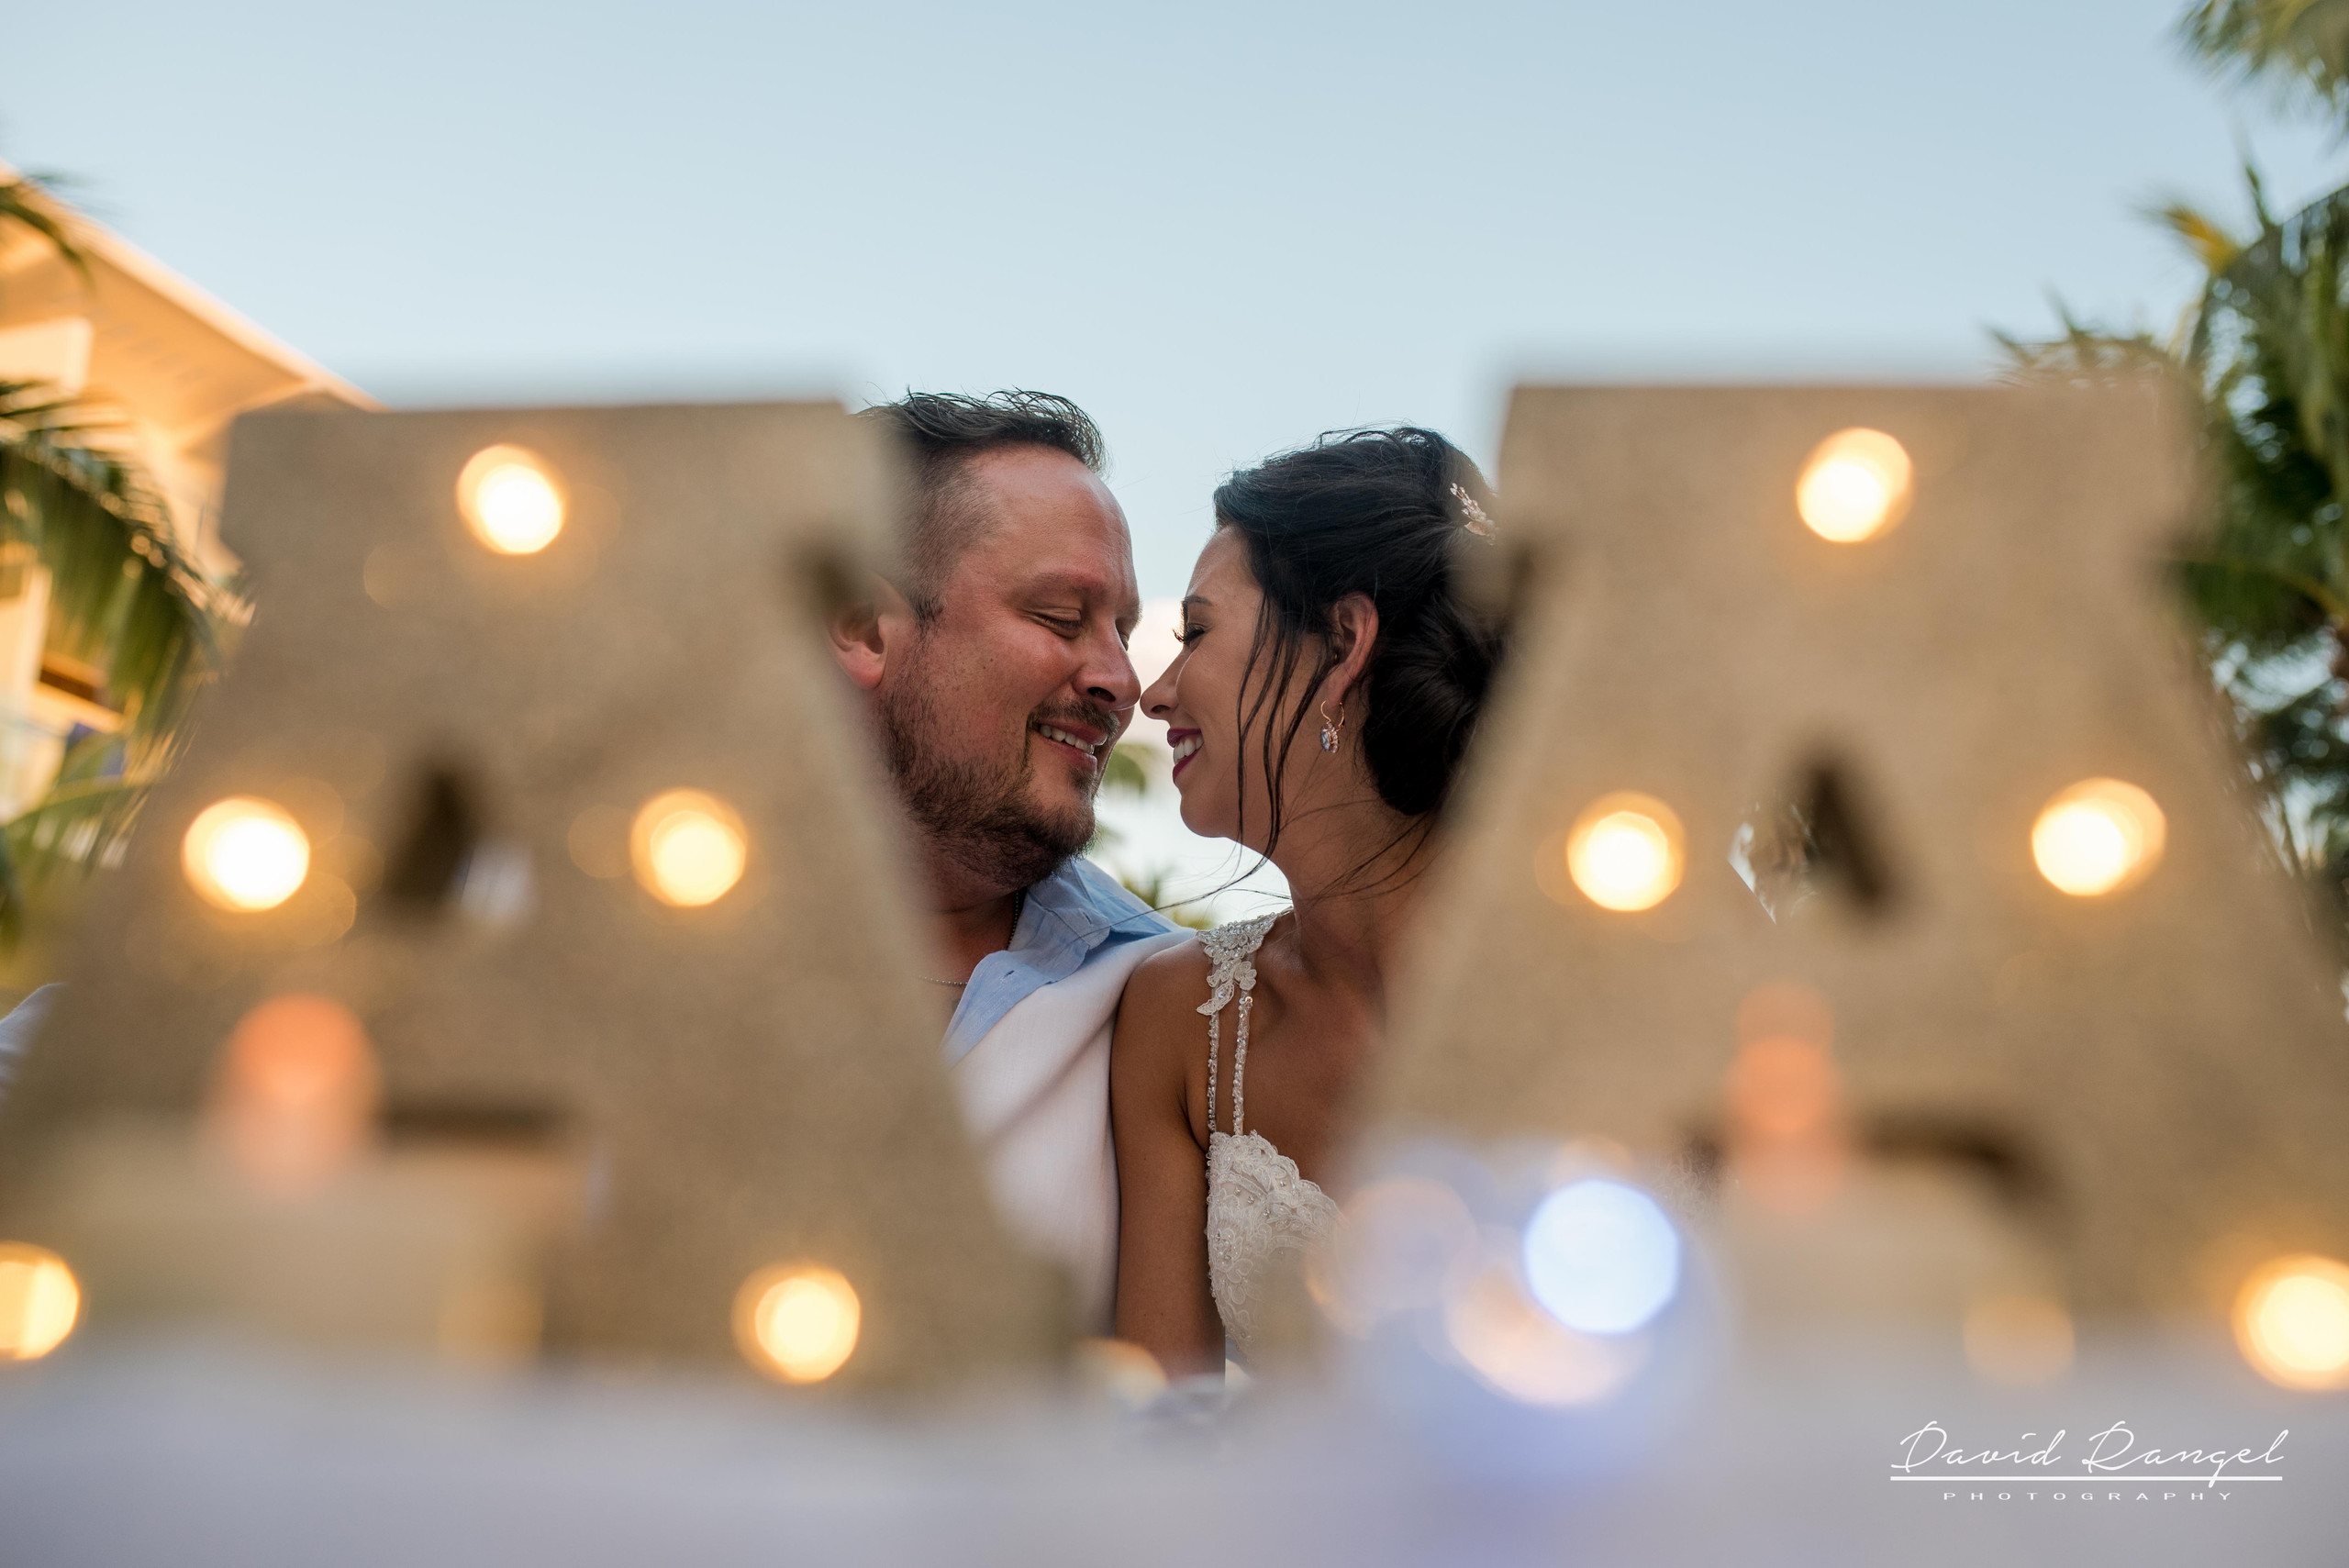 wedding+photo+bride+groom+reception+frame+dinner